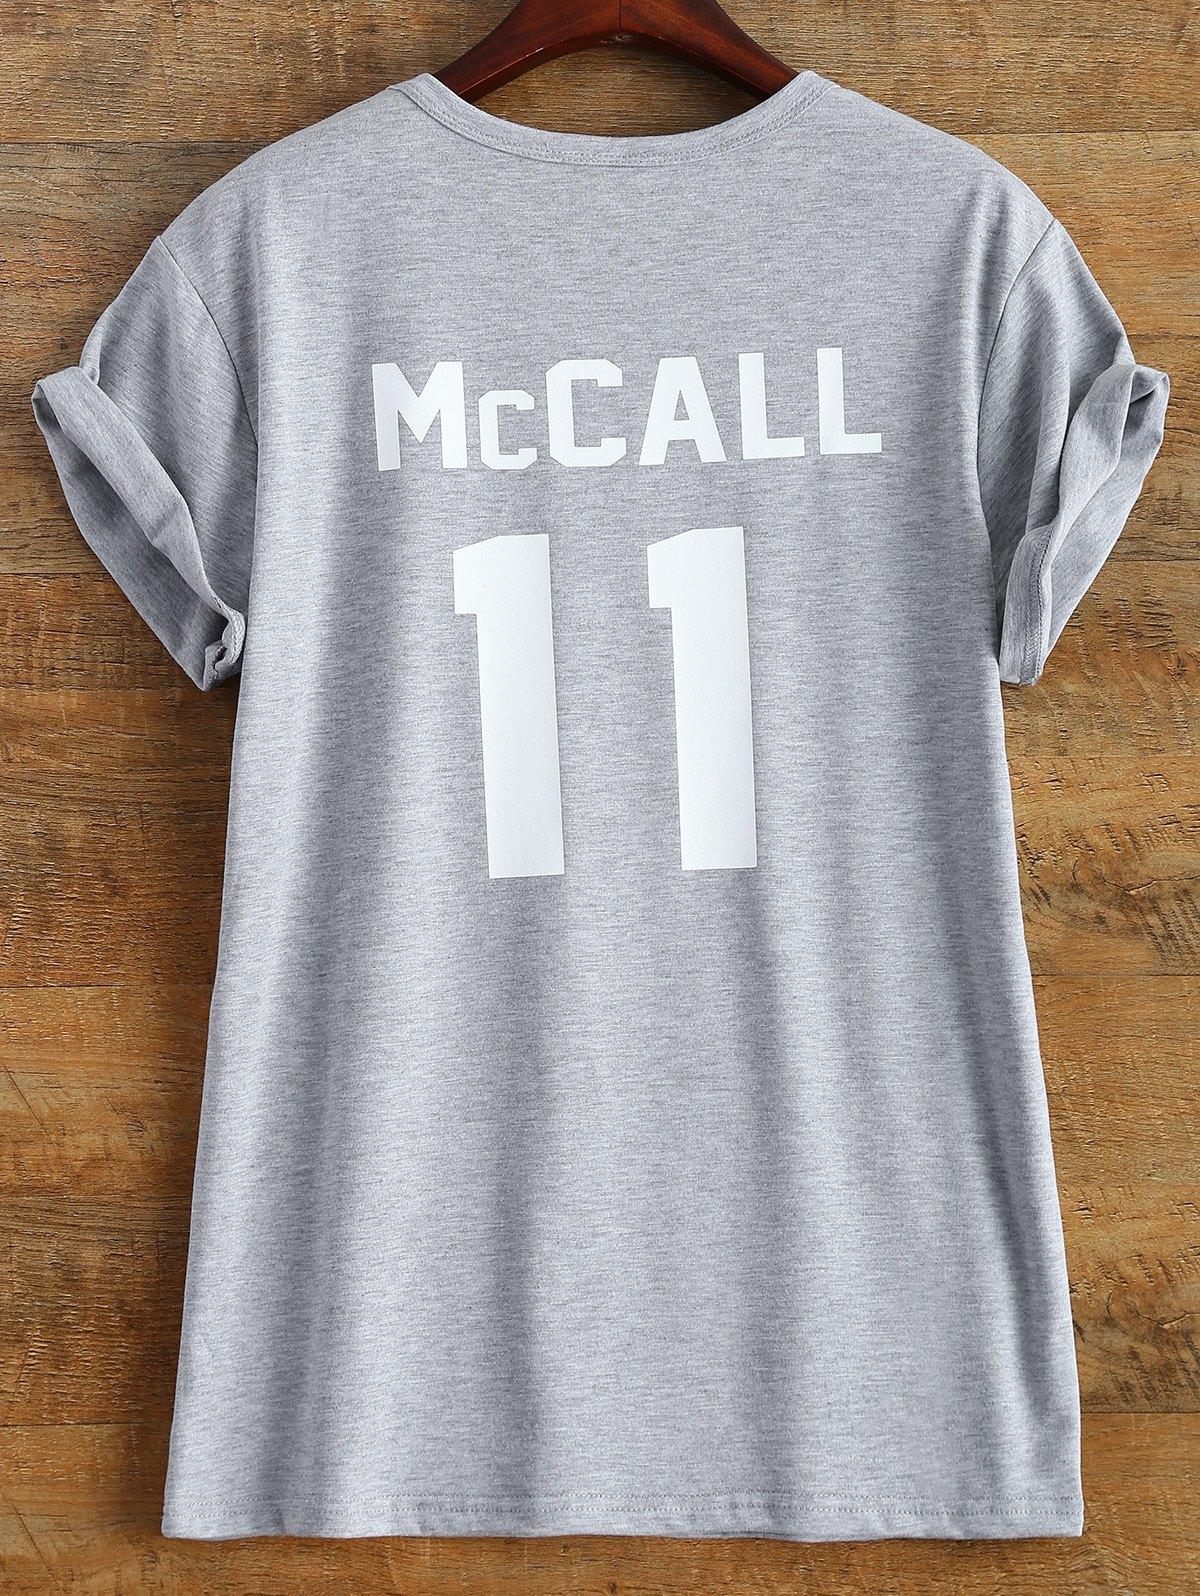 Streetwear Short Sleeve McCall 11 Boyfriend T-Shirt